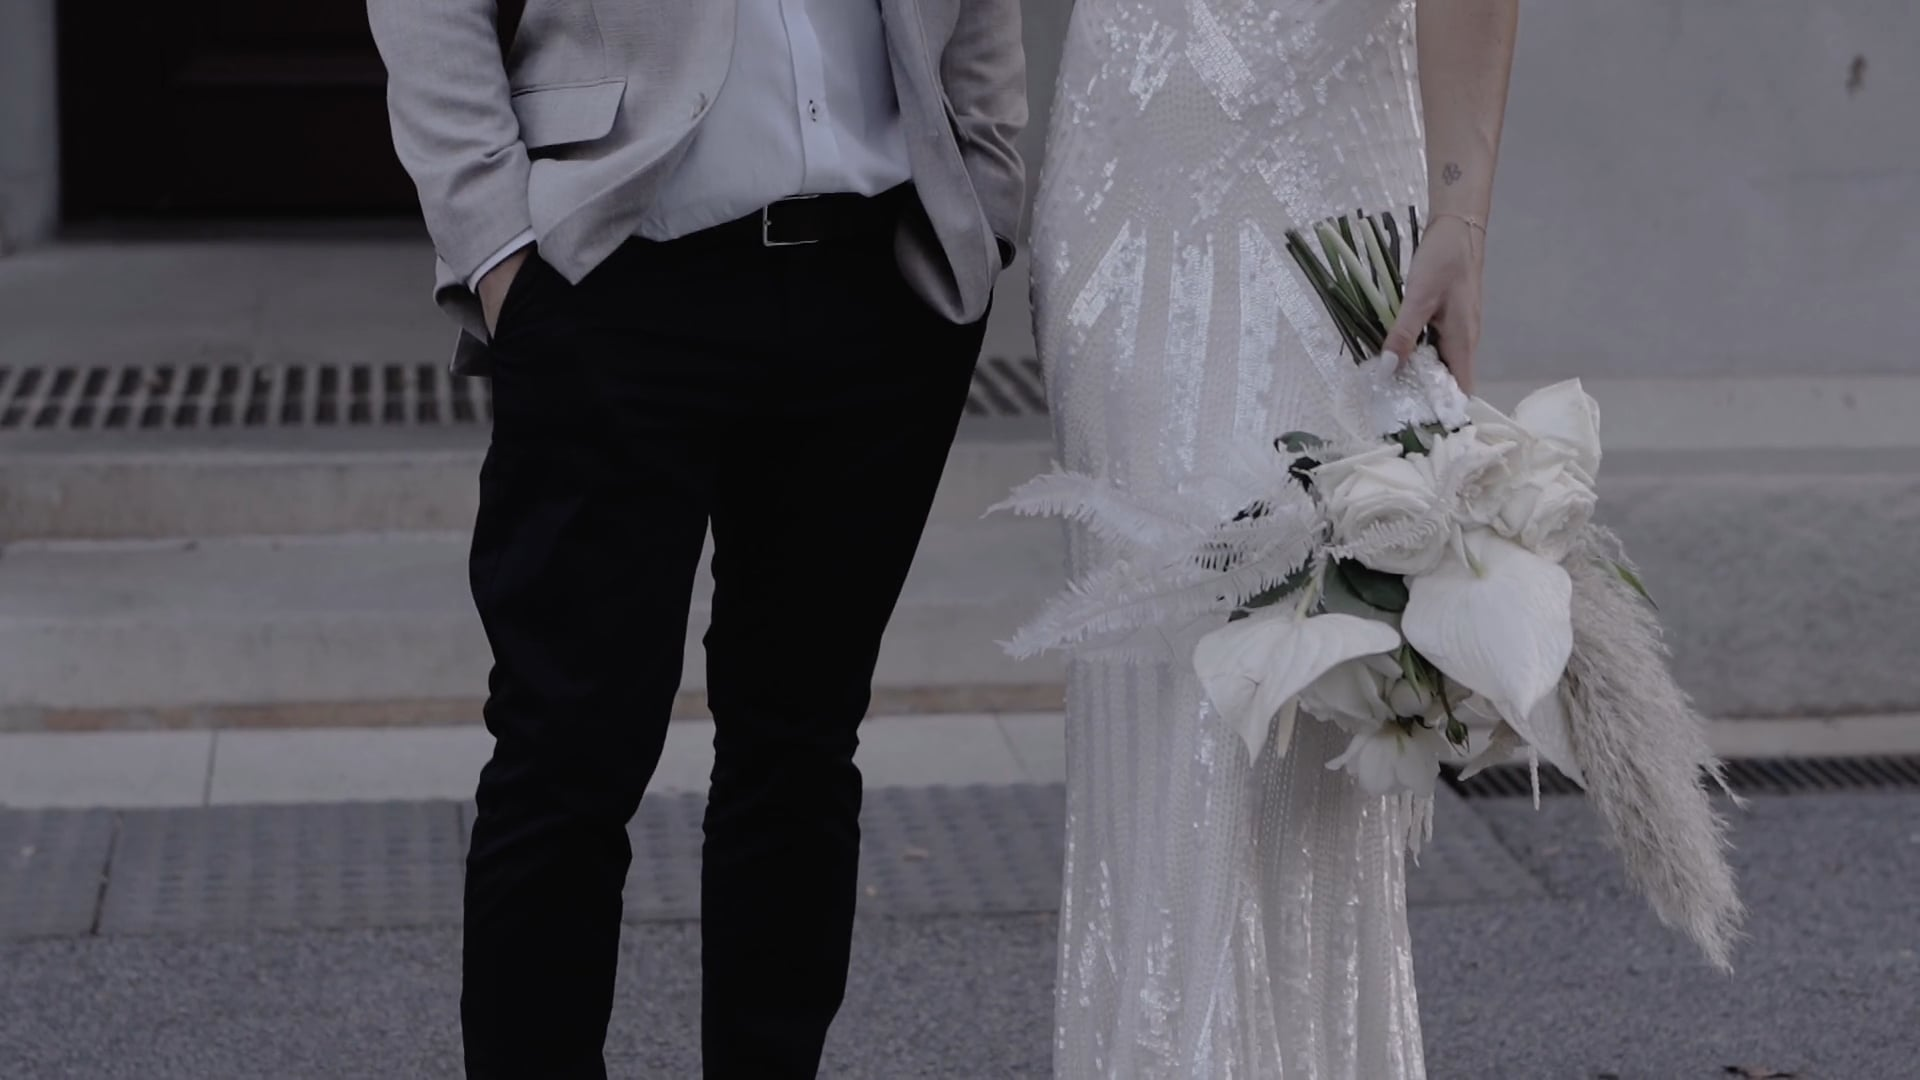 B + J // CITY WEDDING